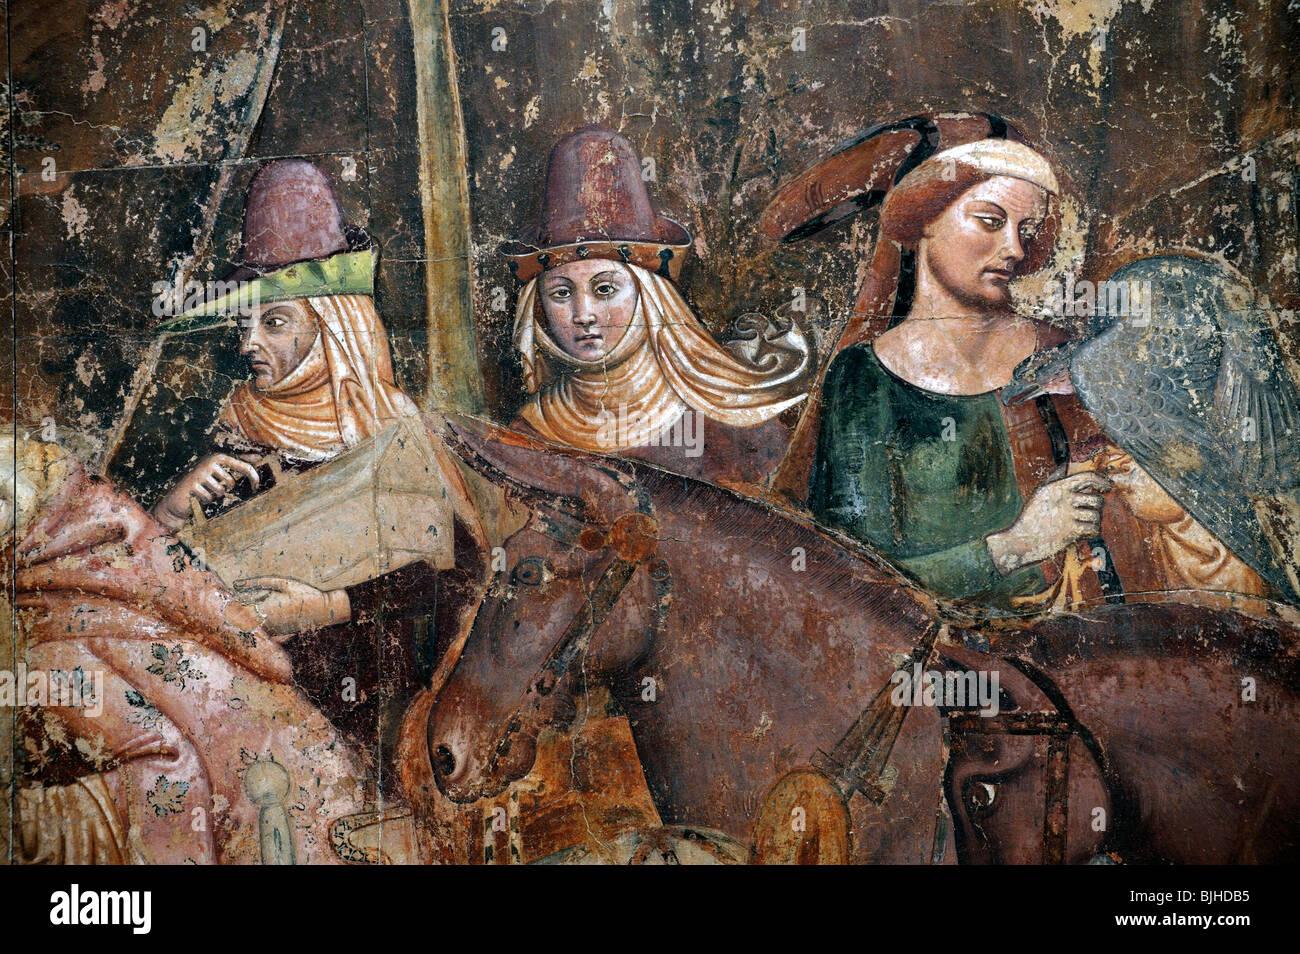 Detail aus 14 C der Triumph des Todes von Bonamico di Martino da Firenze, Buffalmacco in den Camposanto, Pisa, Toskana, Stockbild